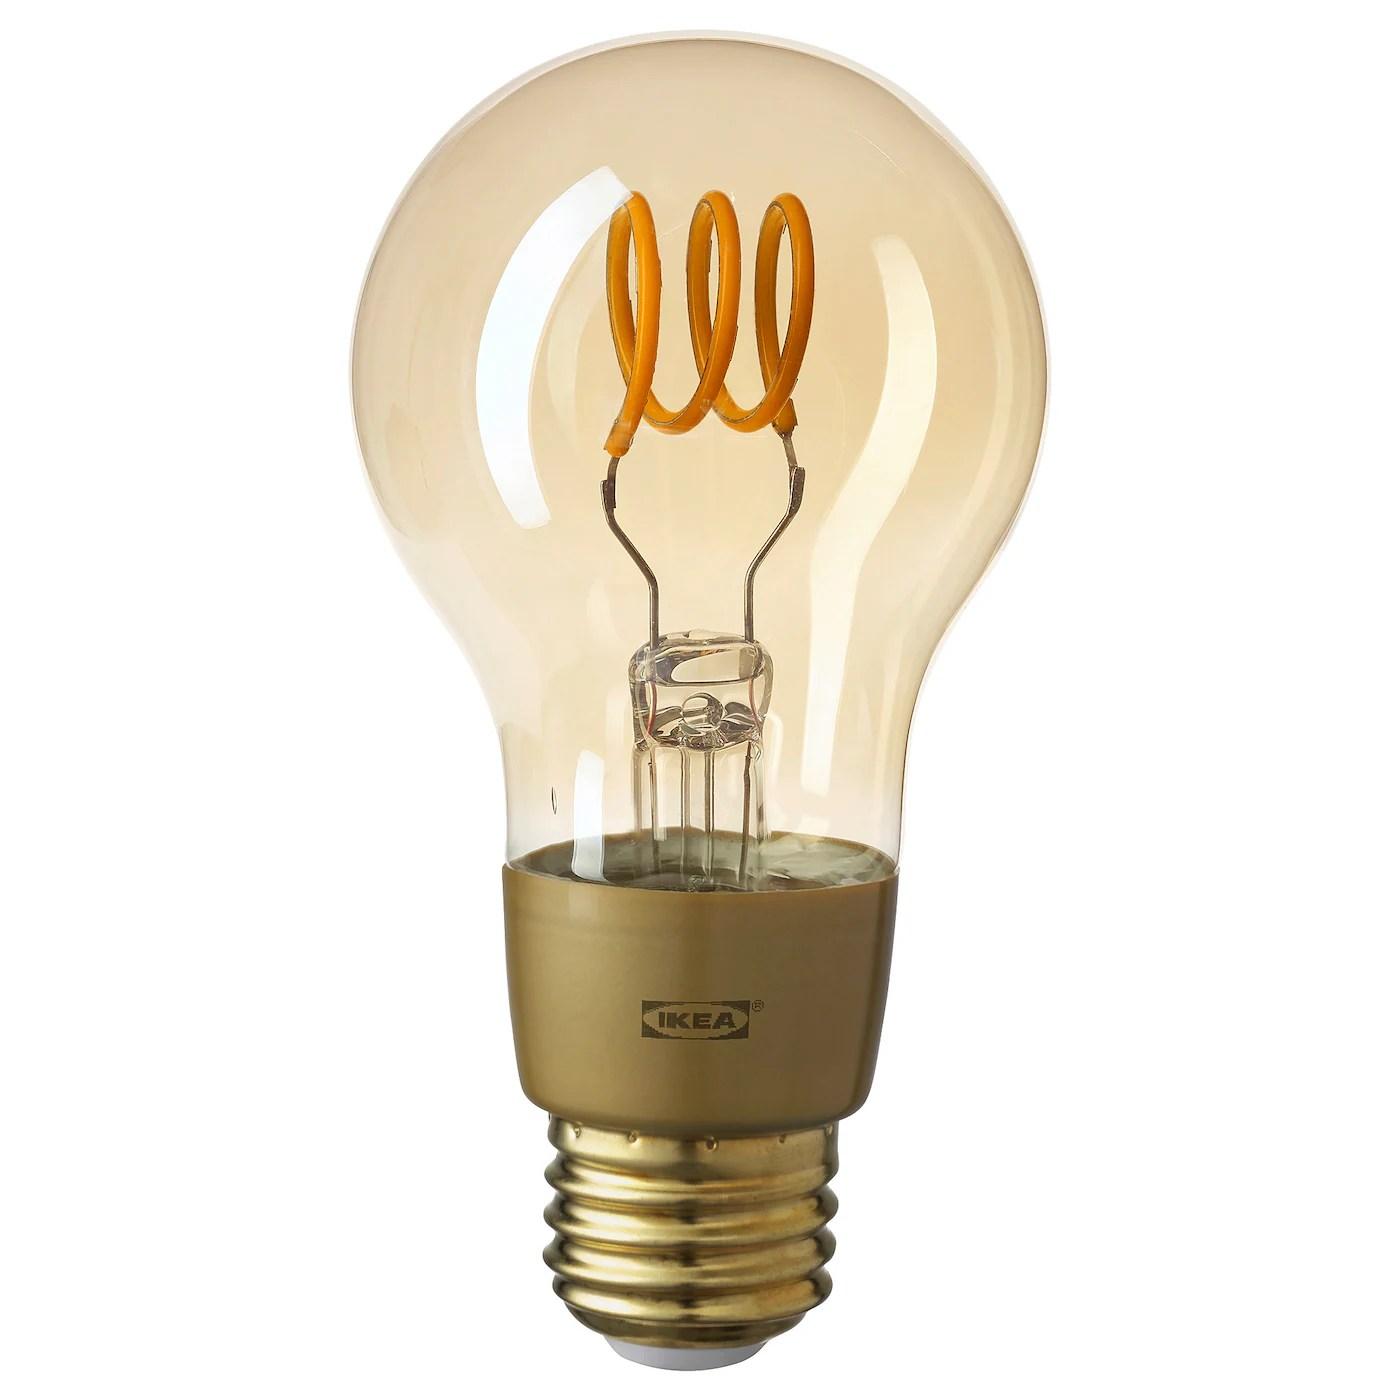 tradfri led bulb e26 250 lumen wireless dimmable warm glow globe brown clear glass